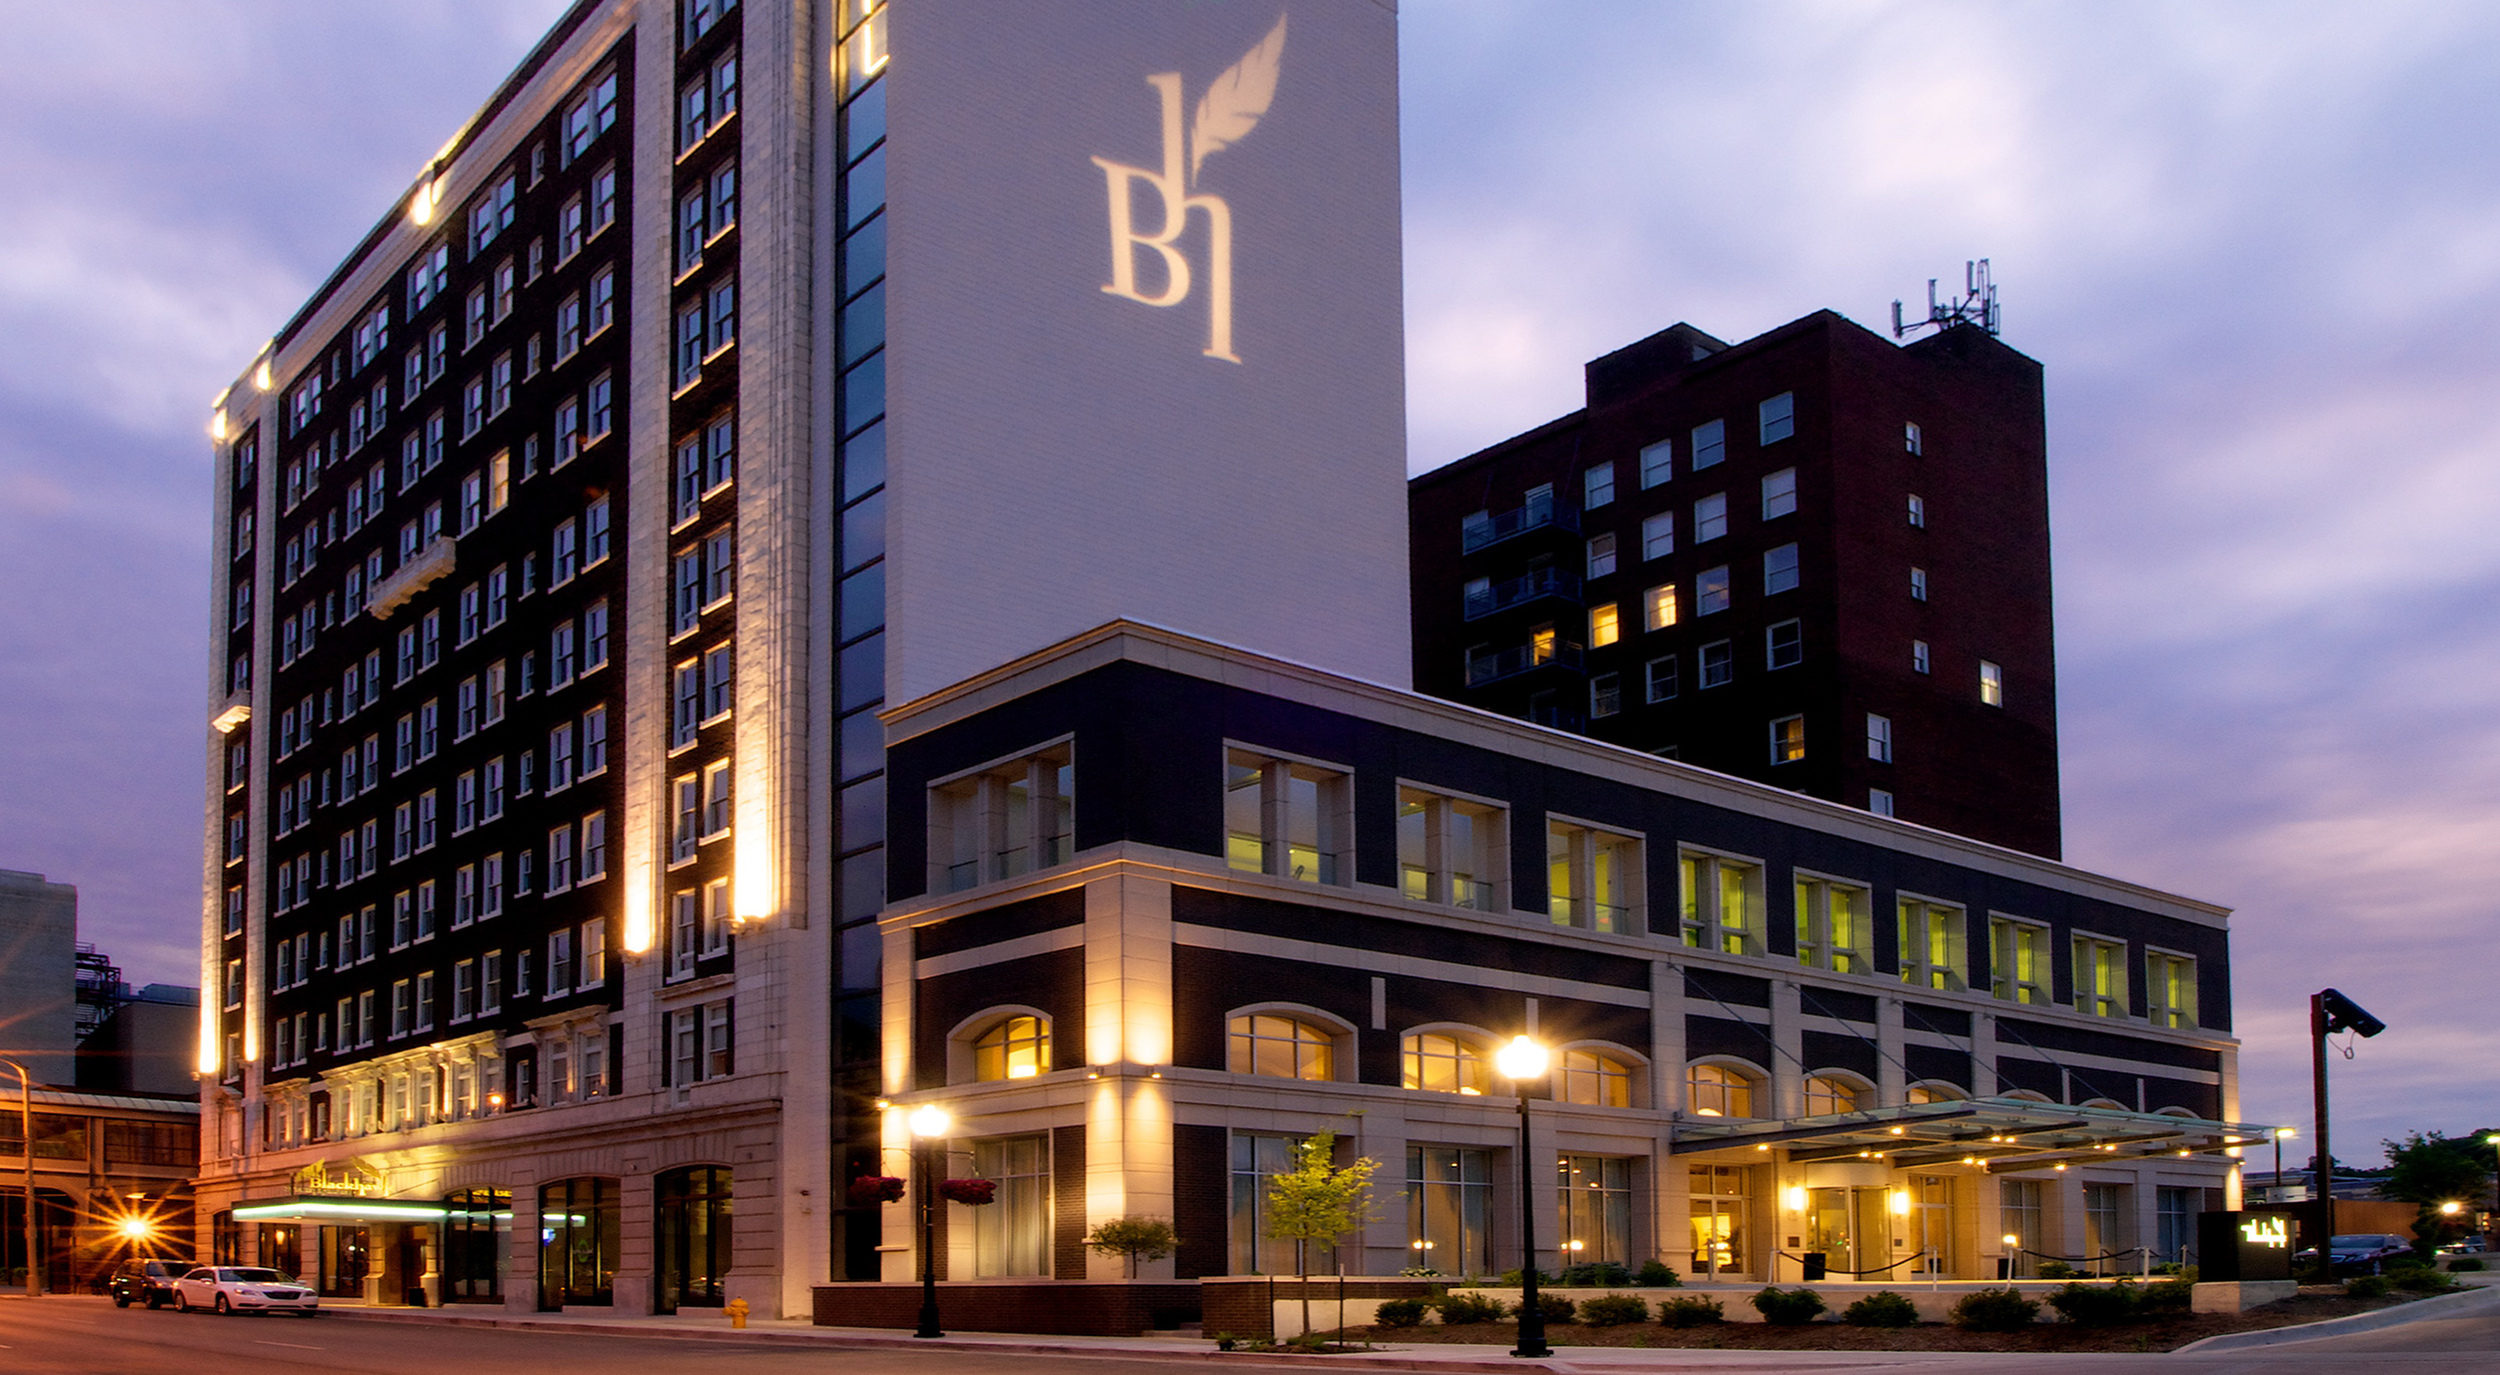 Hotel Blackhawk (Davenport, IA)